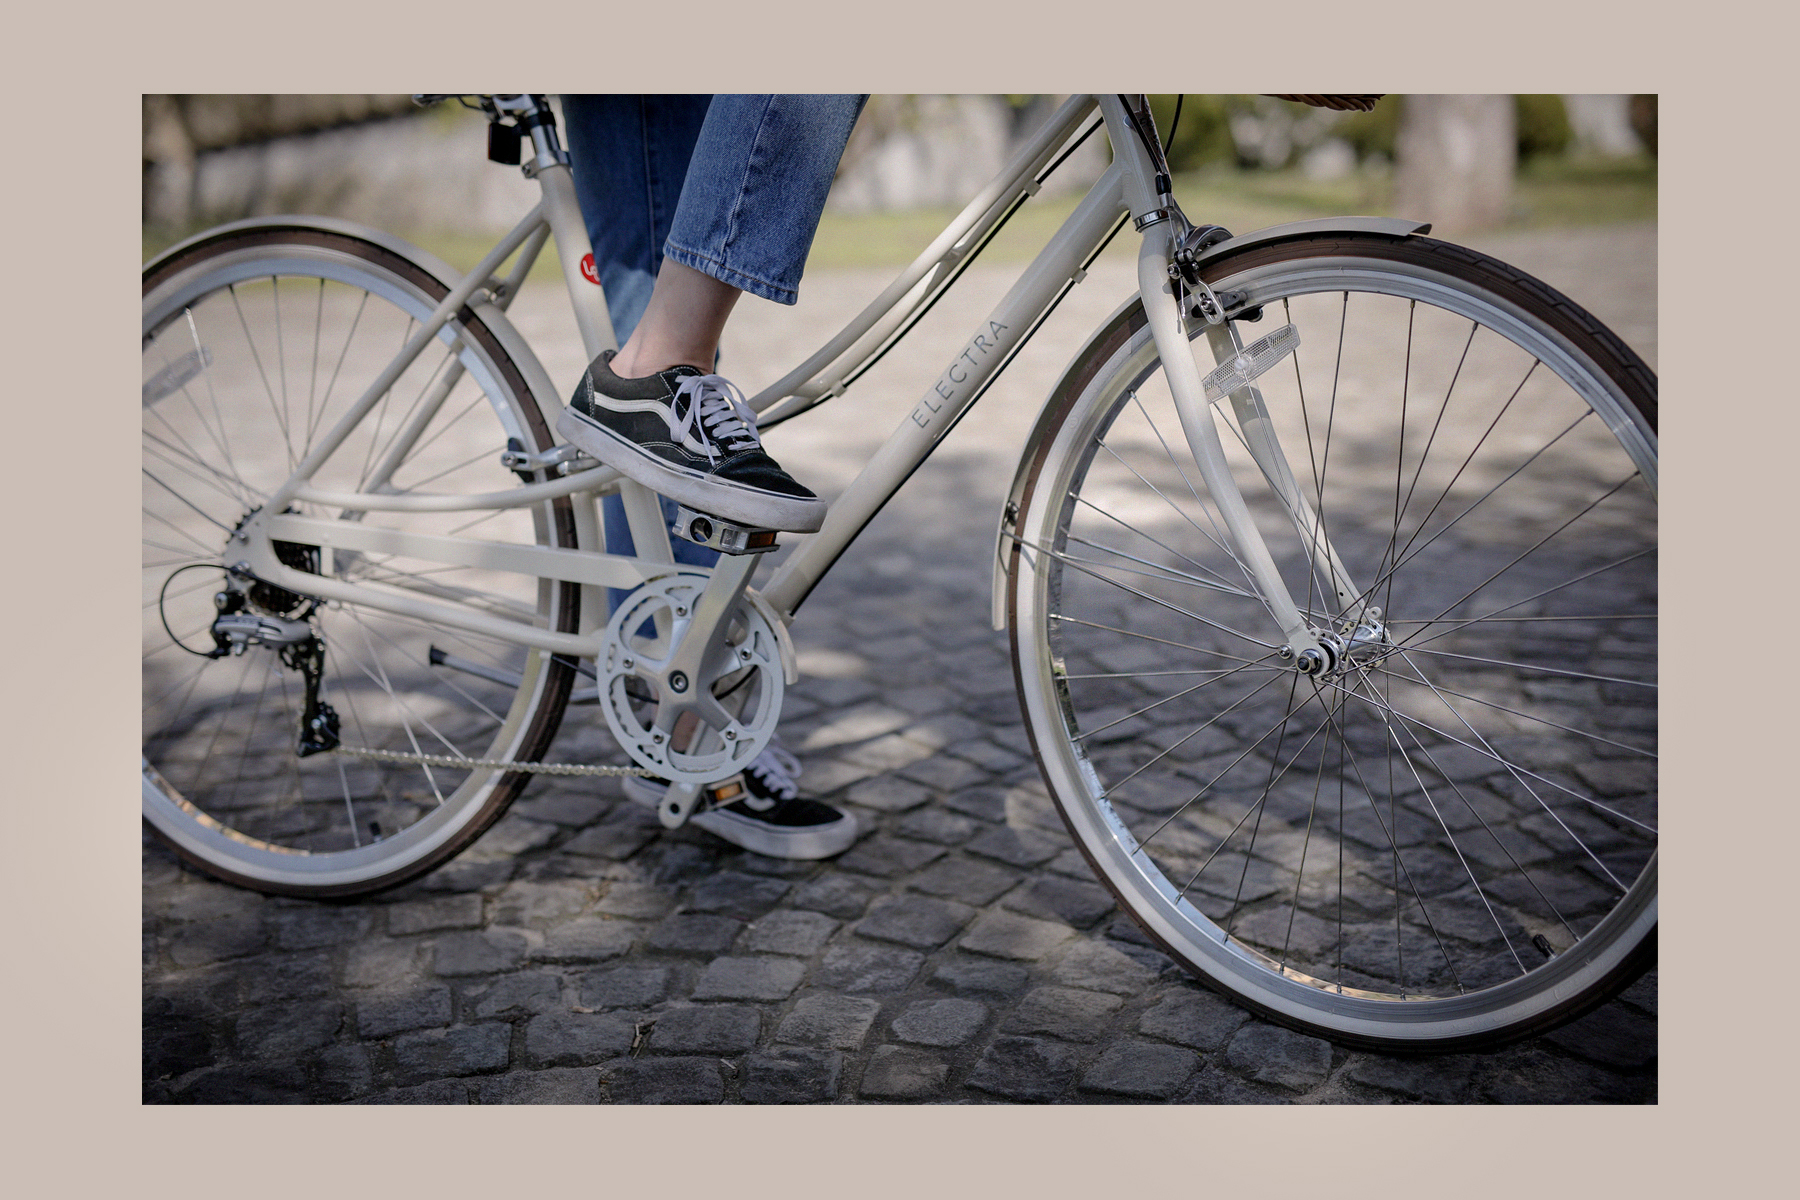 electra bike bicycle fahrrad spring frühling radeln biking loft 7d creme electrabikes catsanddogsblog ricarda schernus modeblog lifestyle blogger styleblog lifestyleblog cats&dogs styleblogger max bechmann fotografie film düsseldorf 3